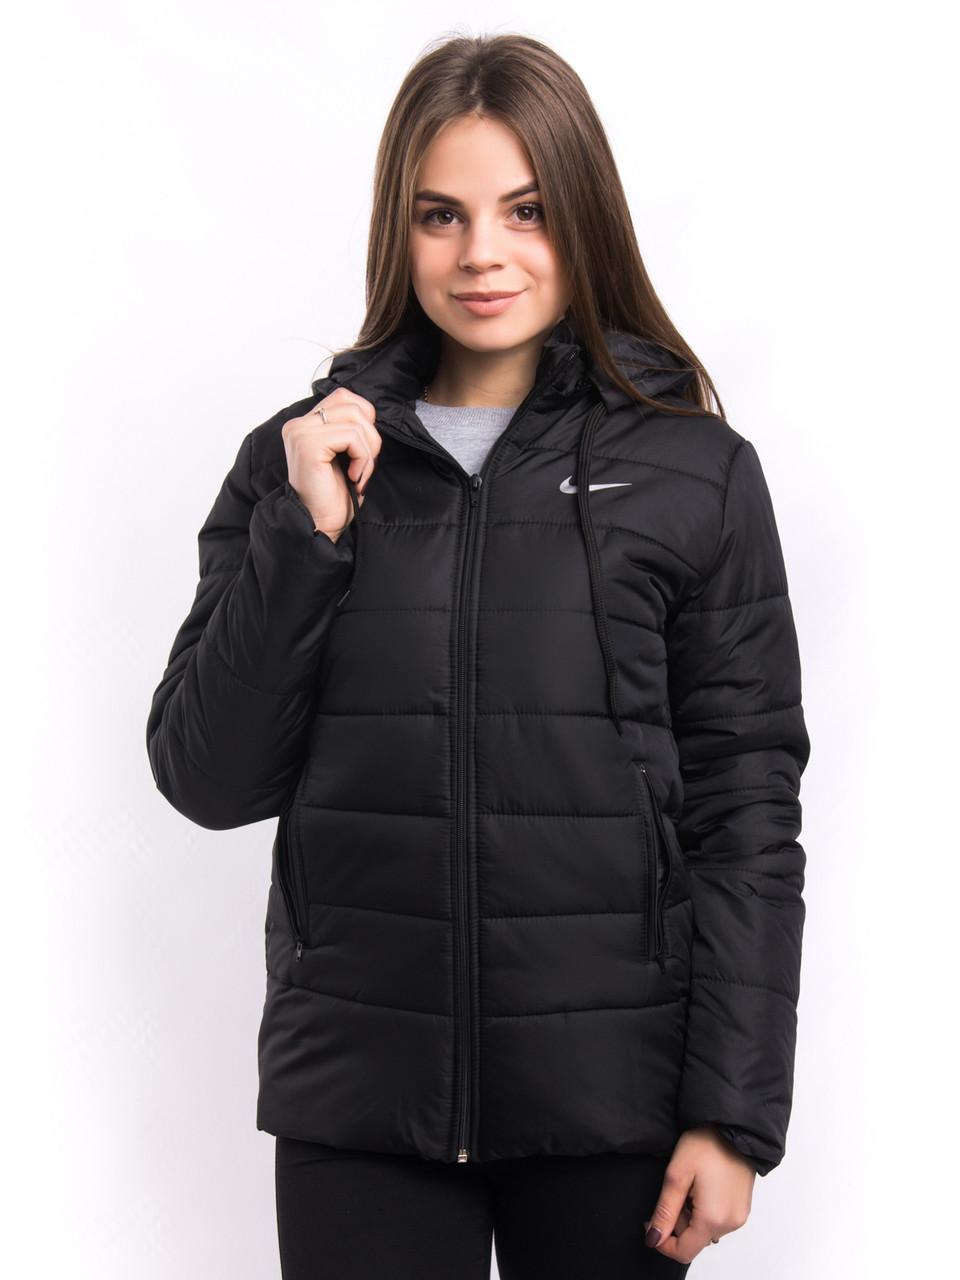 Куртки Женские Интернет Магазин